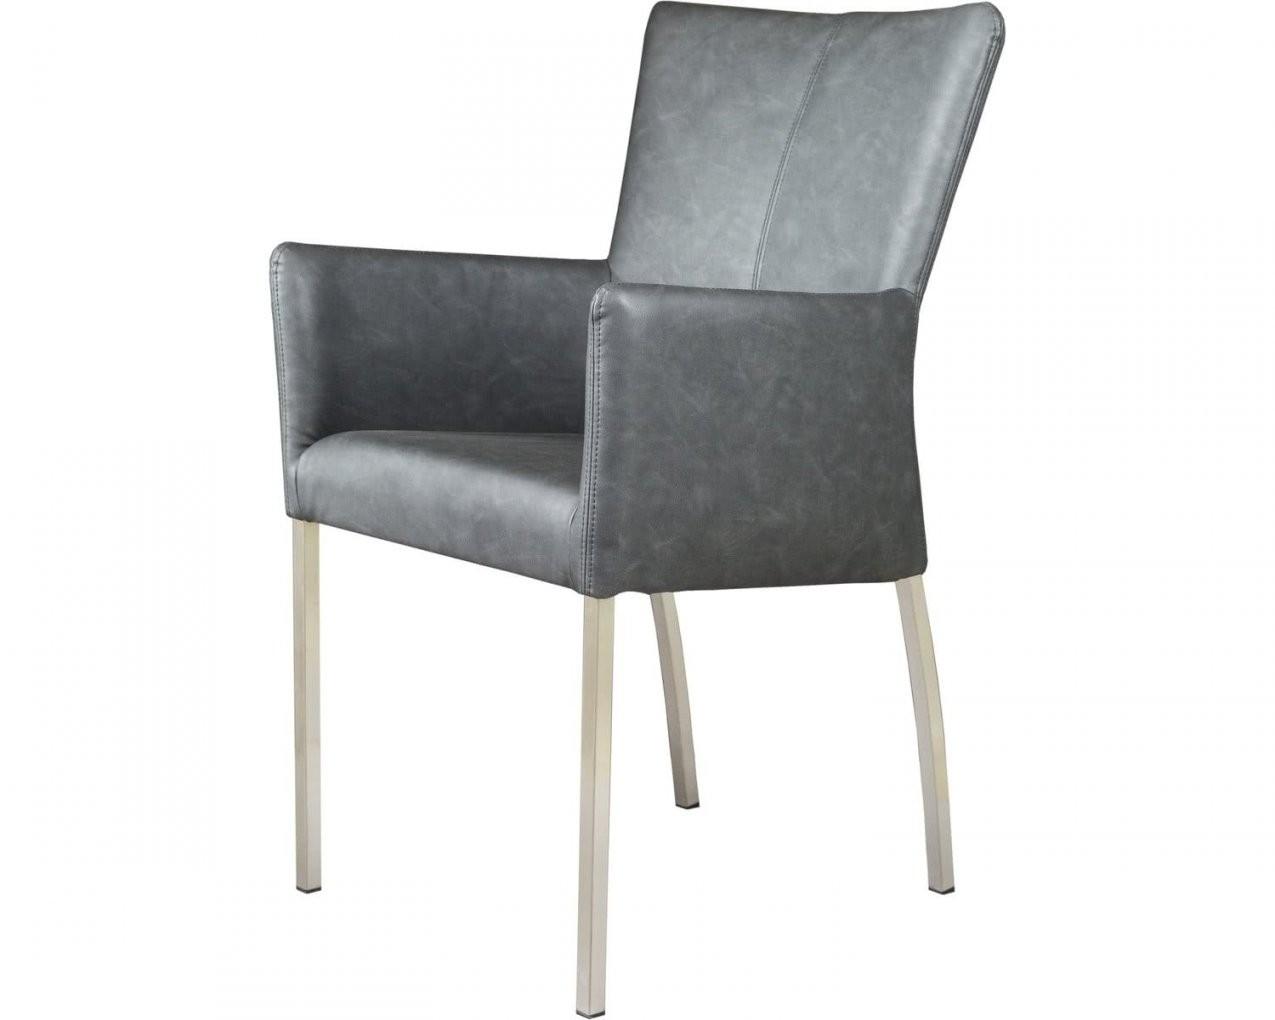 Sit Roma Vintage Stuhl Mit Armlehne Von Leder